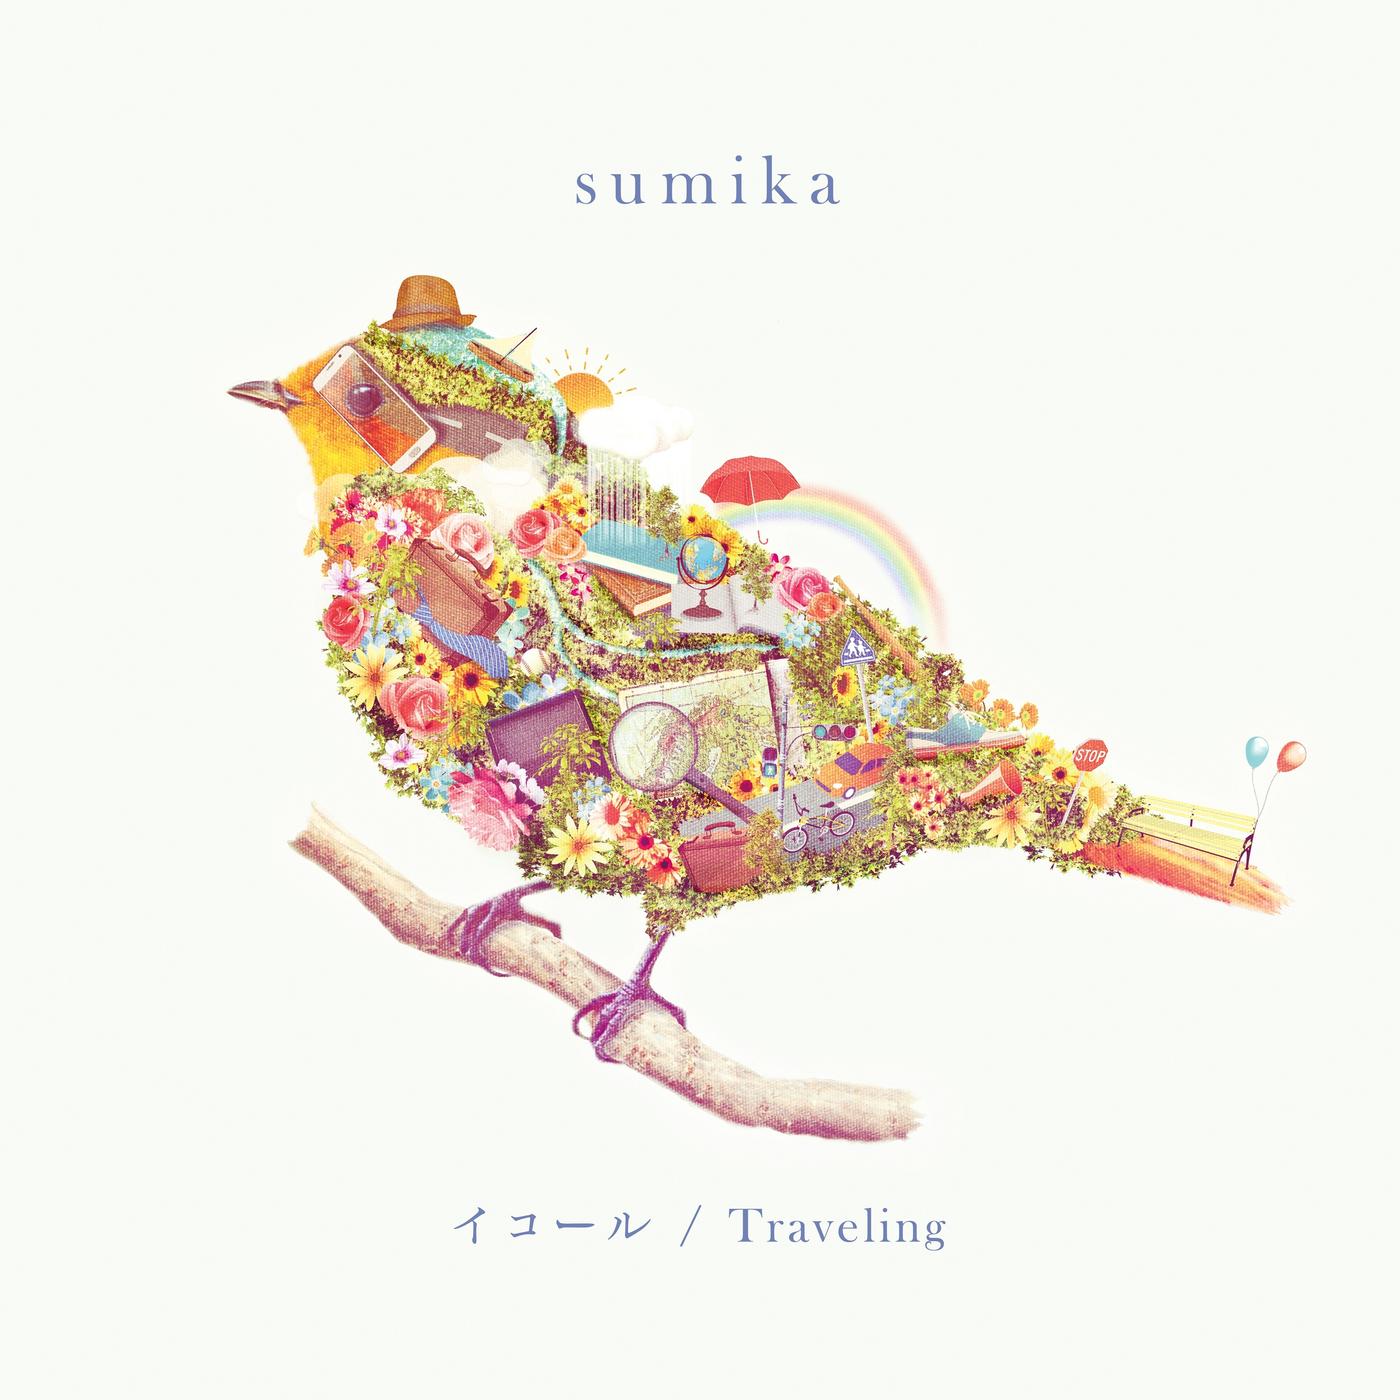 Equal / Traveling - sumika